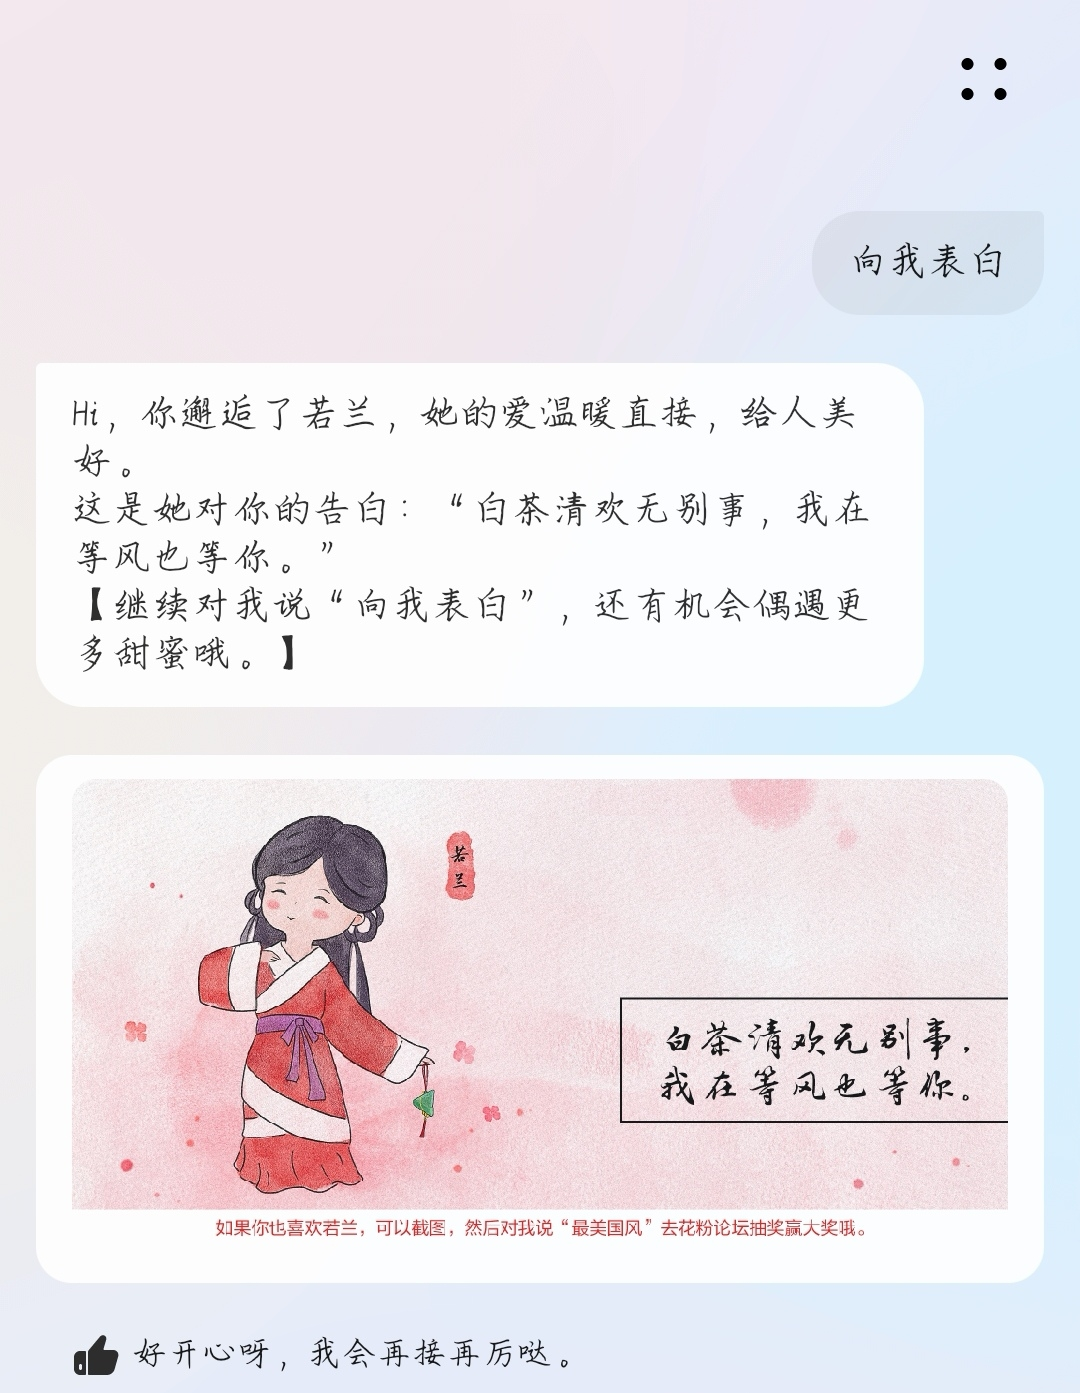 Screenshot_20210611_180304_com.huawei.vassistant_edit_62073647594694.jpg